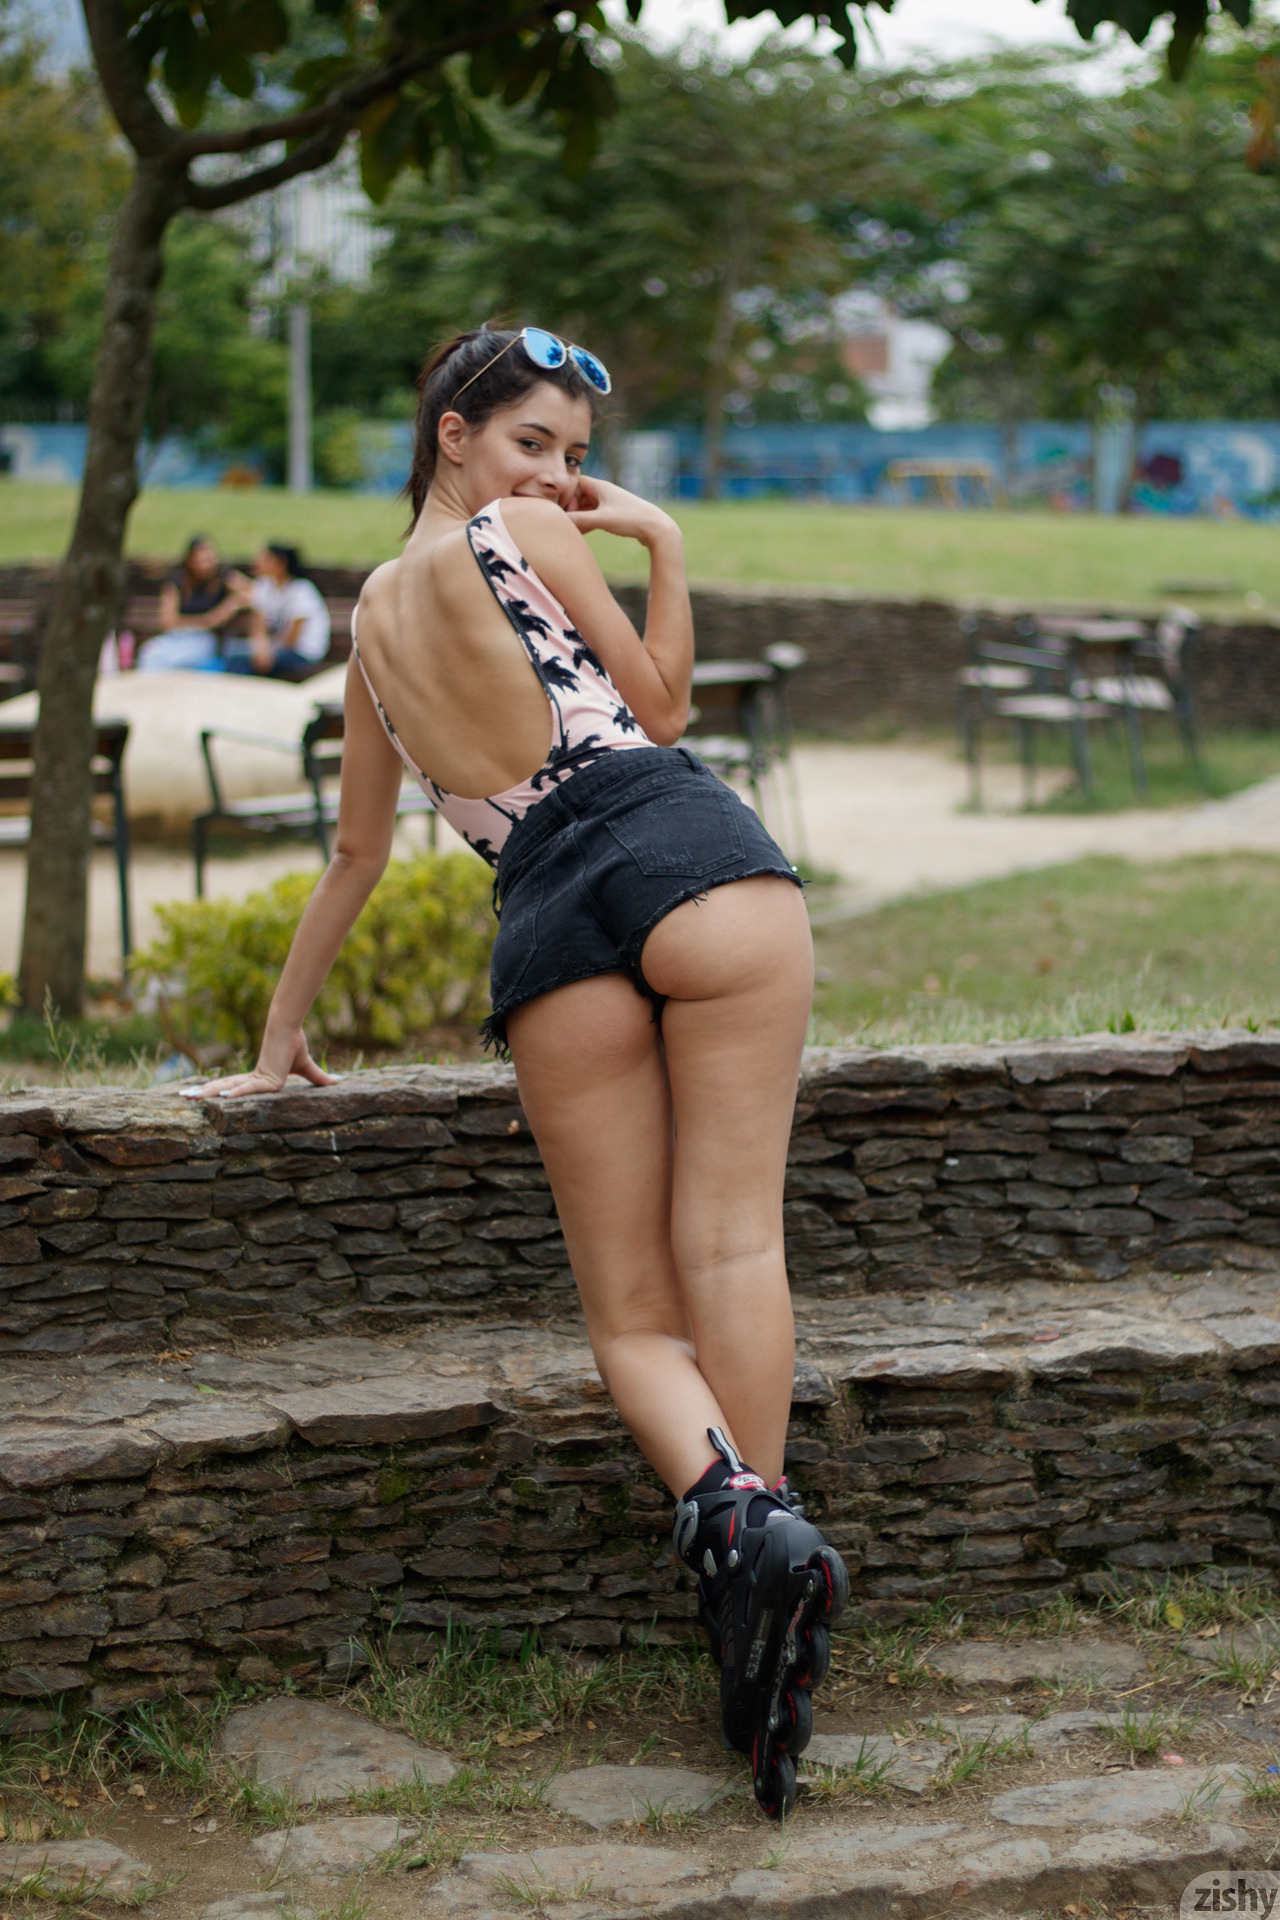 Kate Maze Skates Colombia Zishy (27)